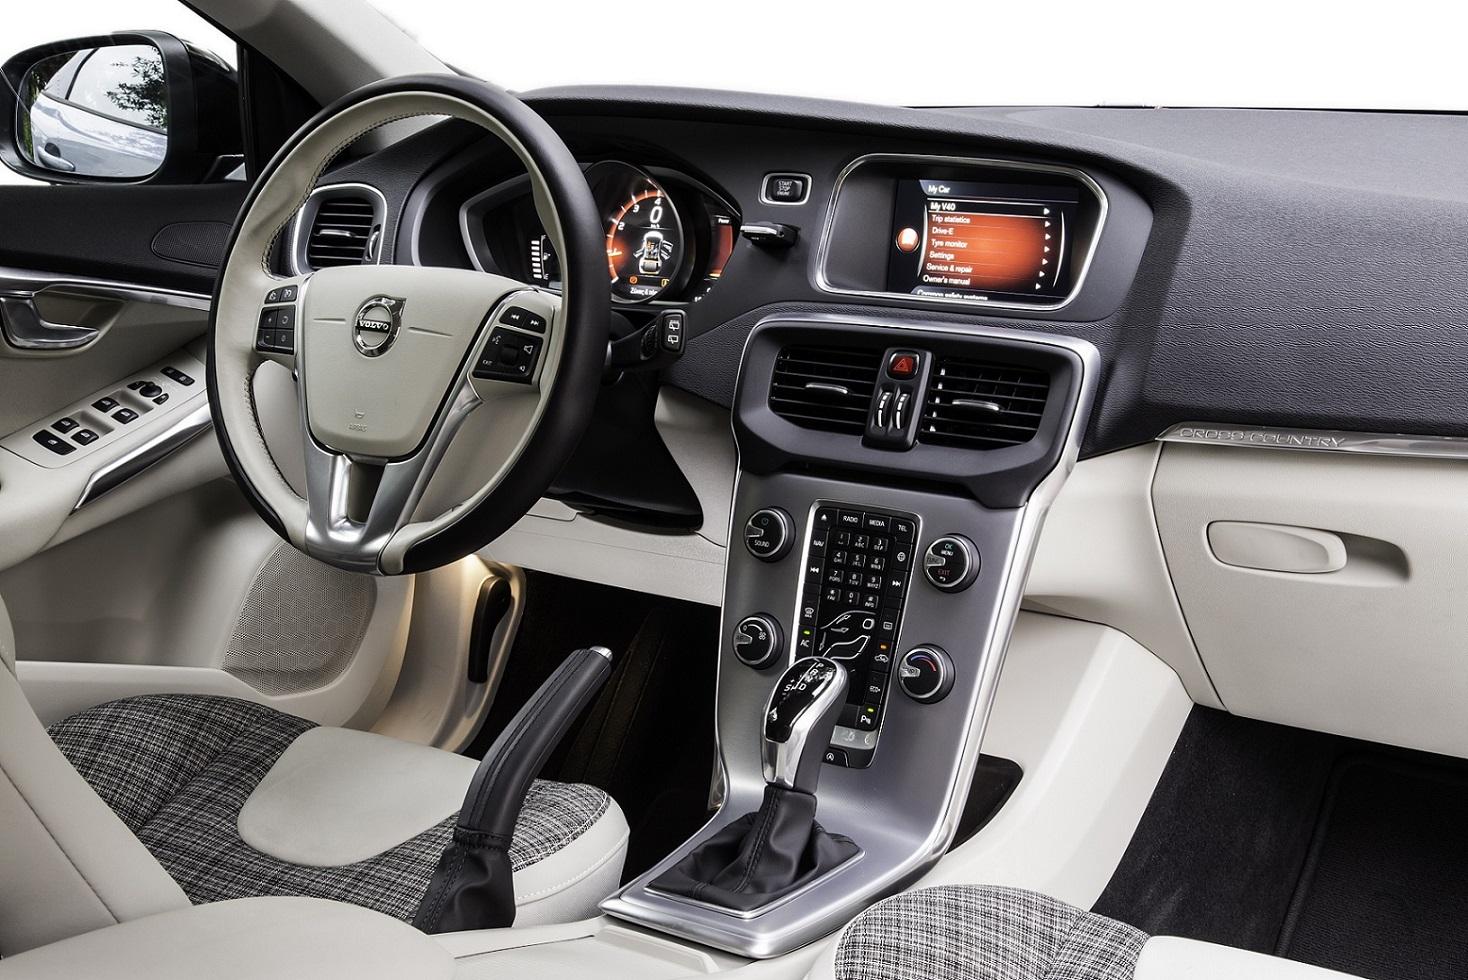 4V402BCROSS2BCOUNTRY2BT32B1.52BAUTO 8 Από 21.900 ευρώ το Volvo V40 Cross Country Volvo, Volvo V40 Cross Country 1.5 T3, αυτοκίνητα, καινούργιο, καινούρια, τιμες